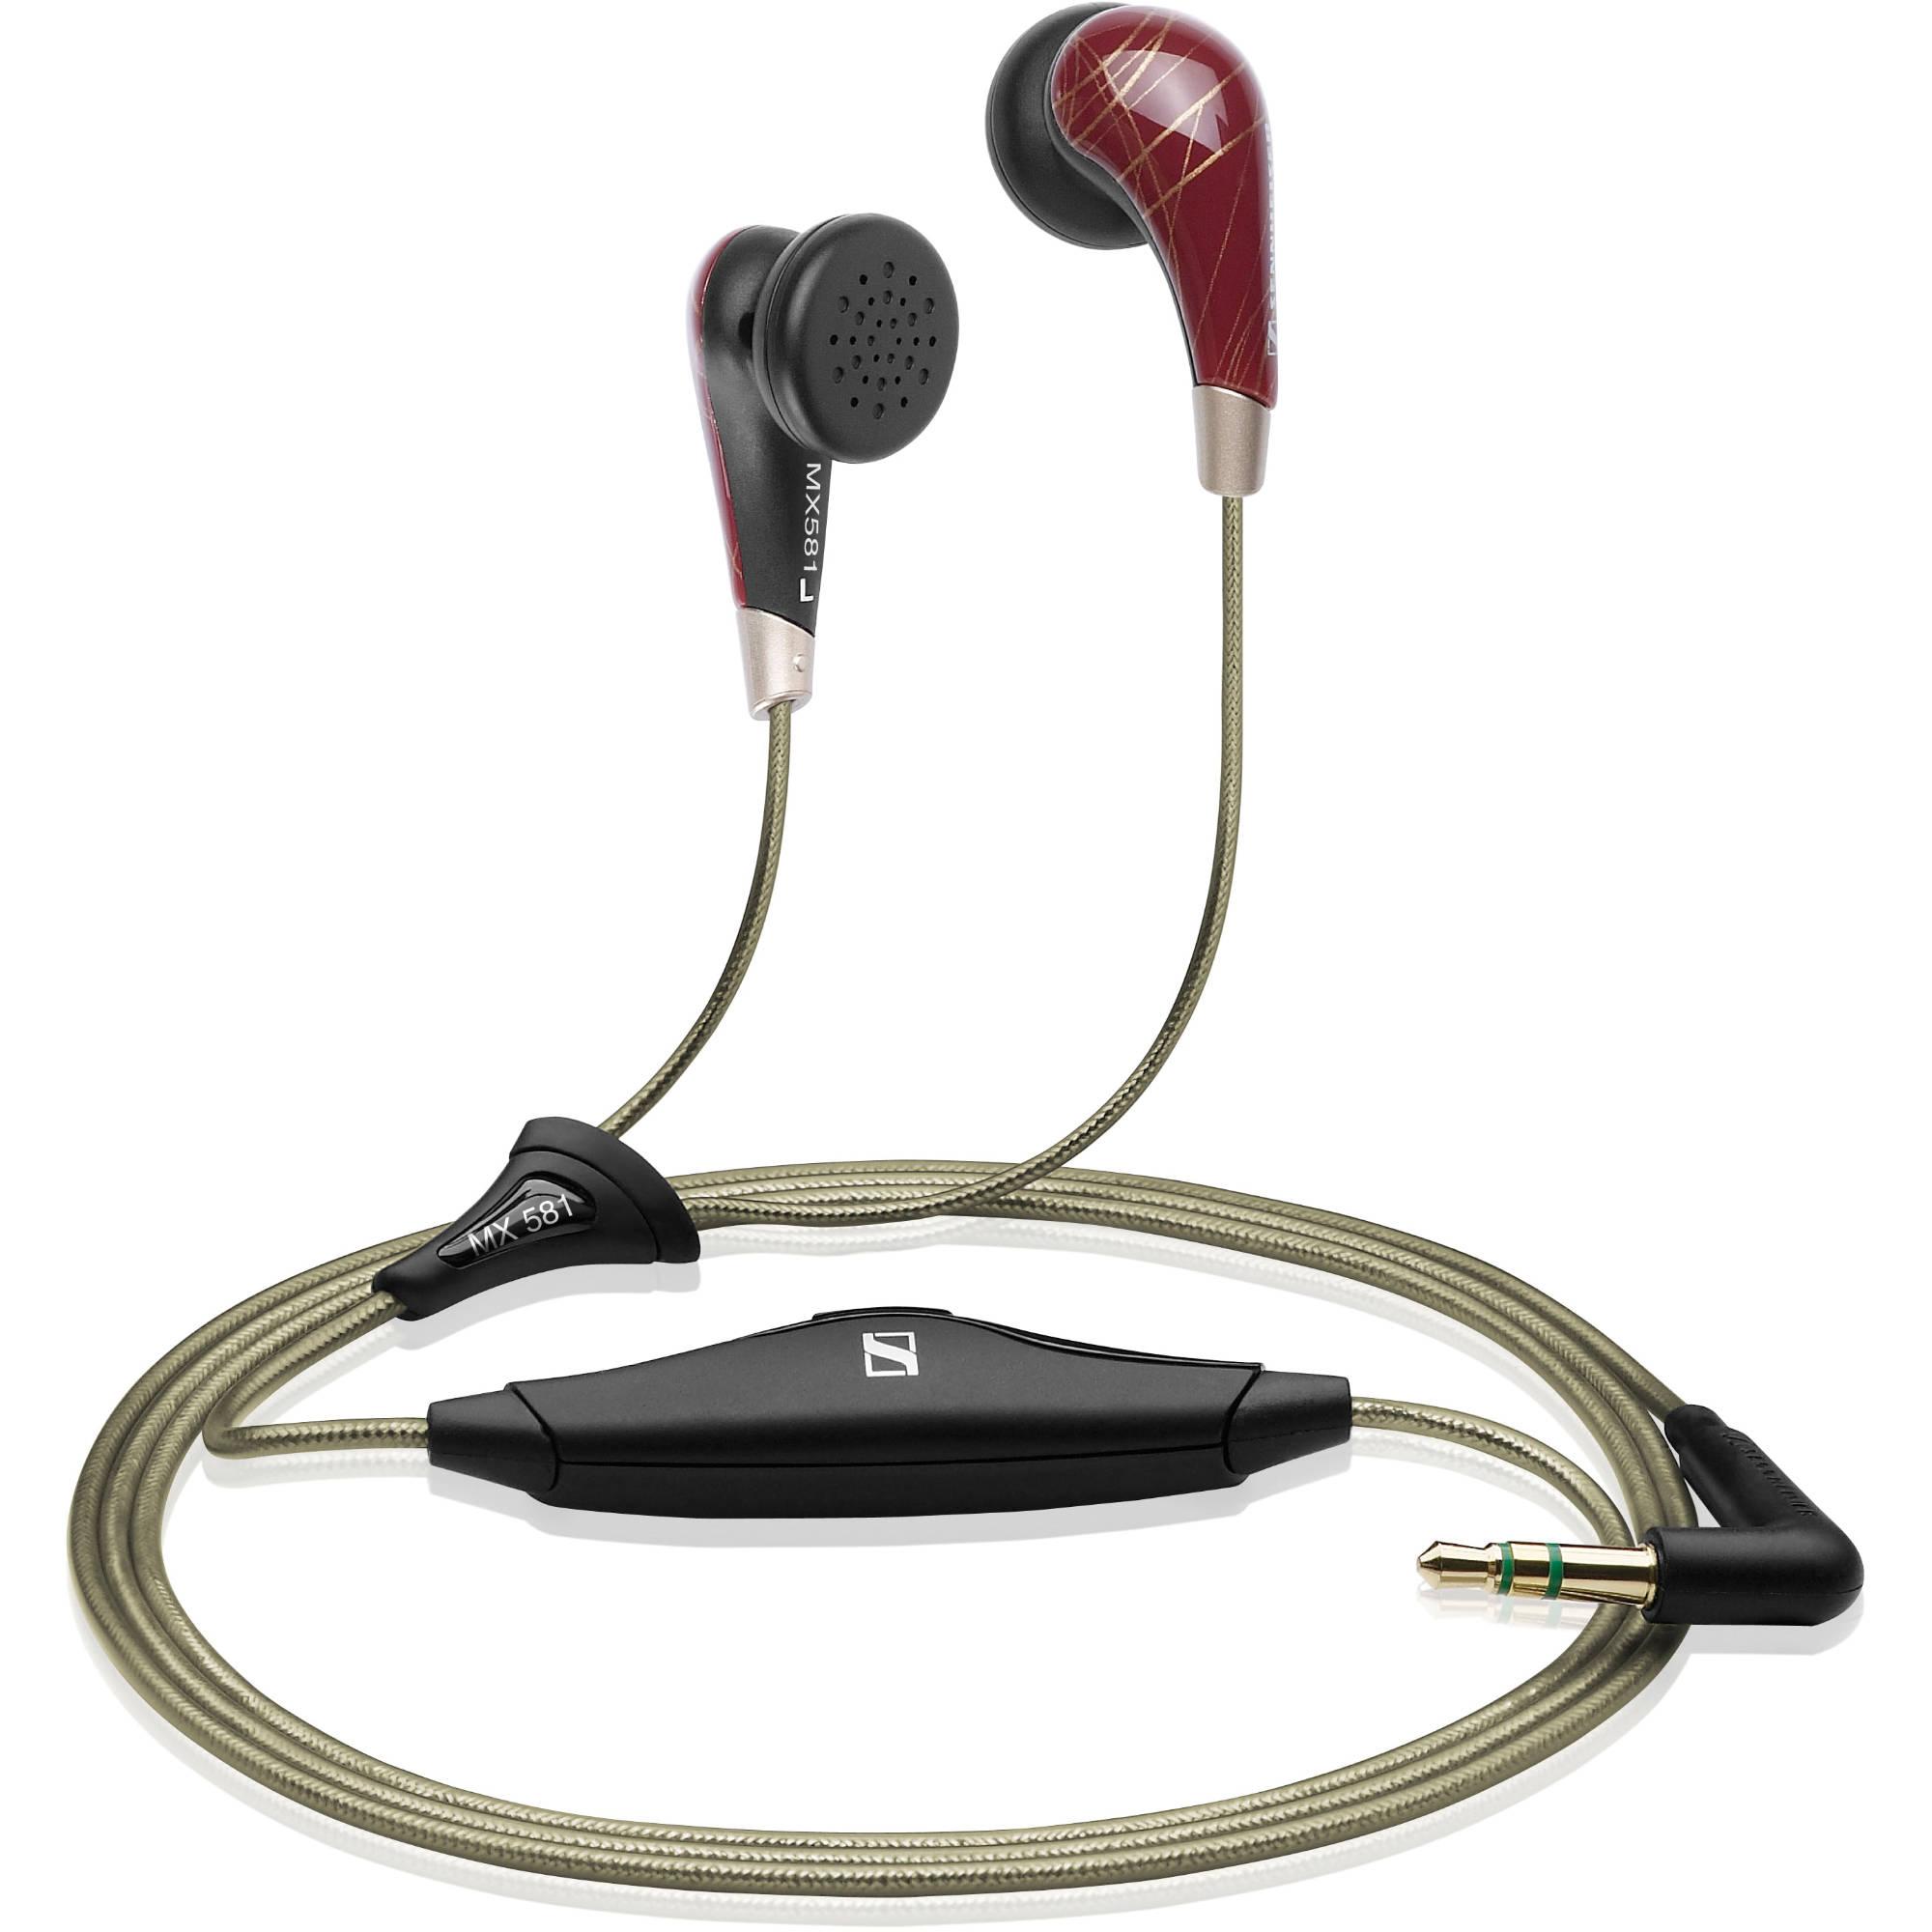 Sennheiser earbuds mx - sennheiser earbuds cx